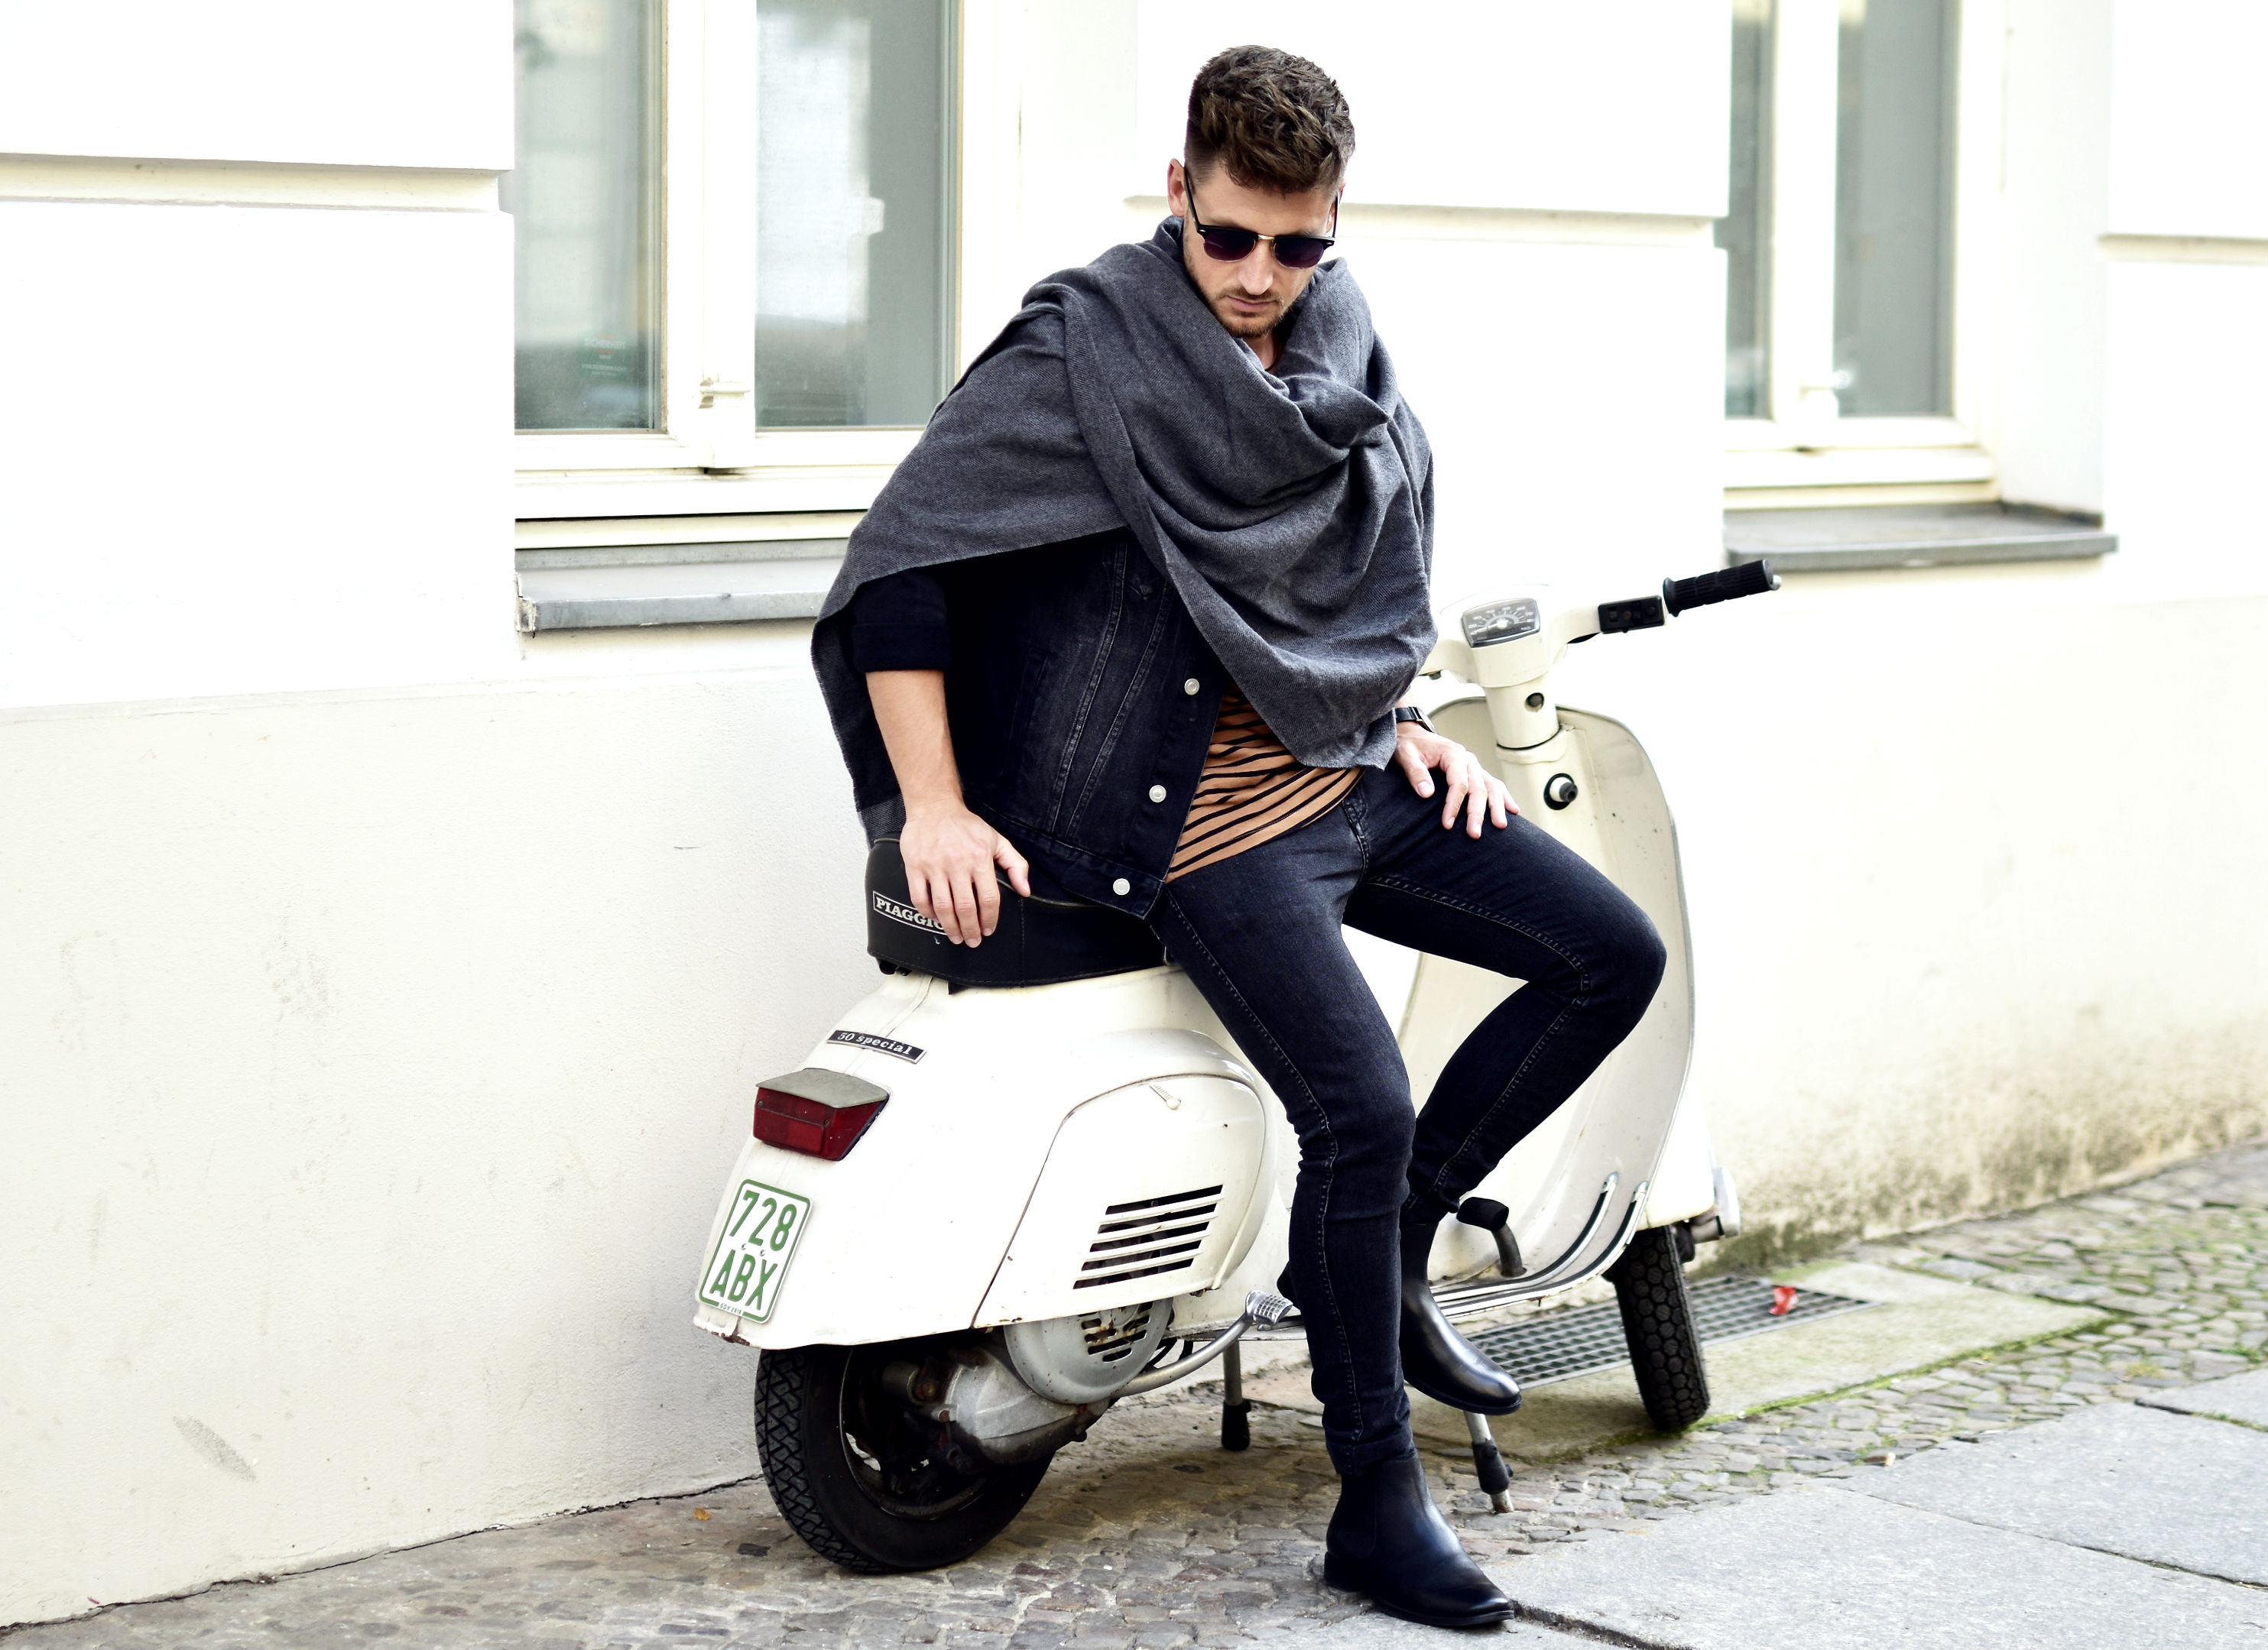 tommeezjerry-styleblog-maennerblog-maenner-modeblog-berlin-berlinblog-maennermodeblog-outfit-herbstlook-autumnlook-all-black-chelsea-boots-poncho-Sieger